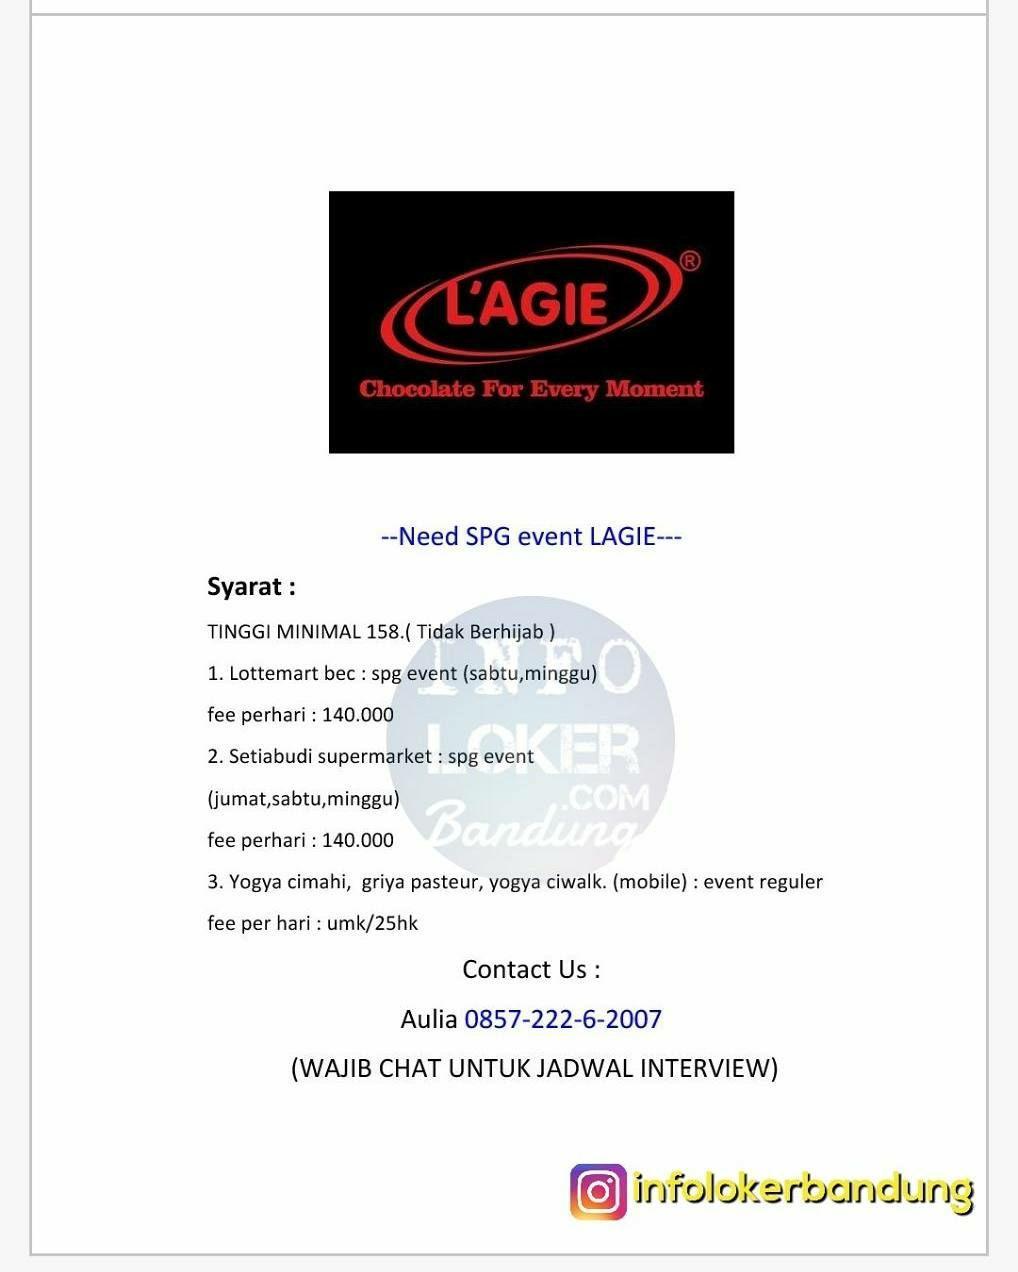 Lowongan Kerja SPG Event L'AGIE Bandung November 2017